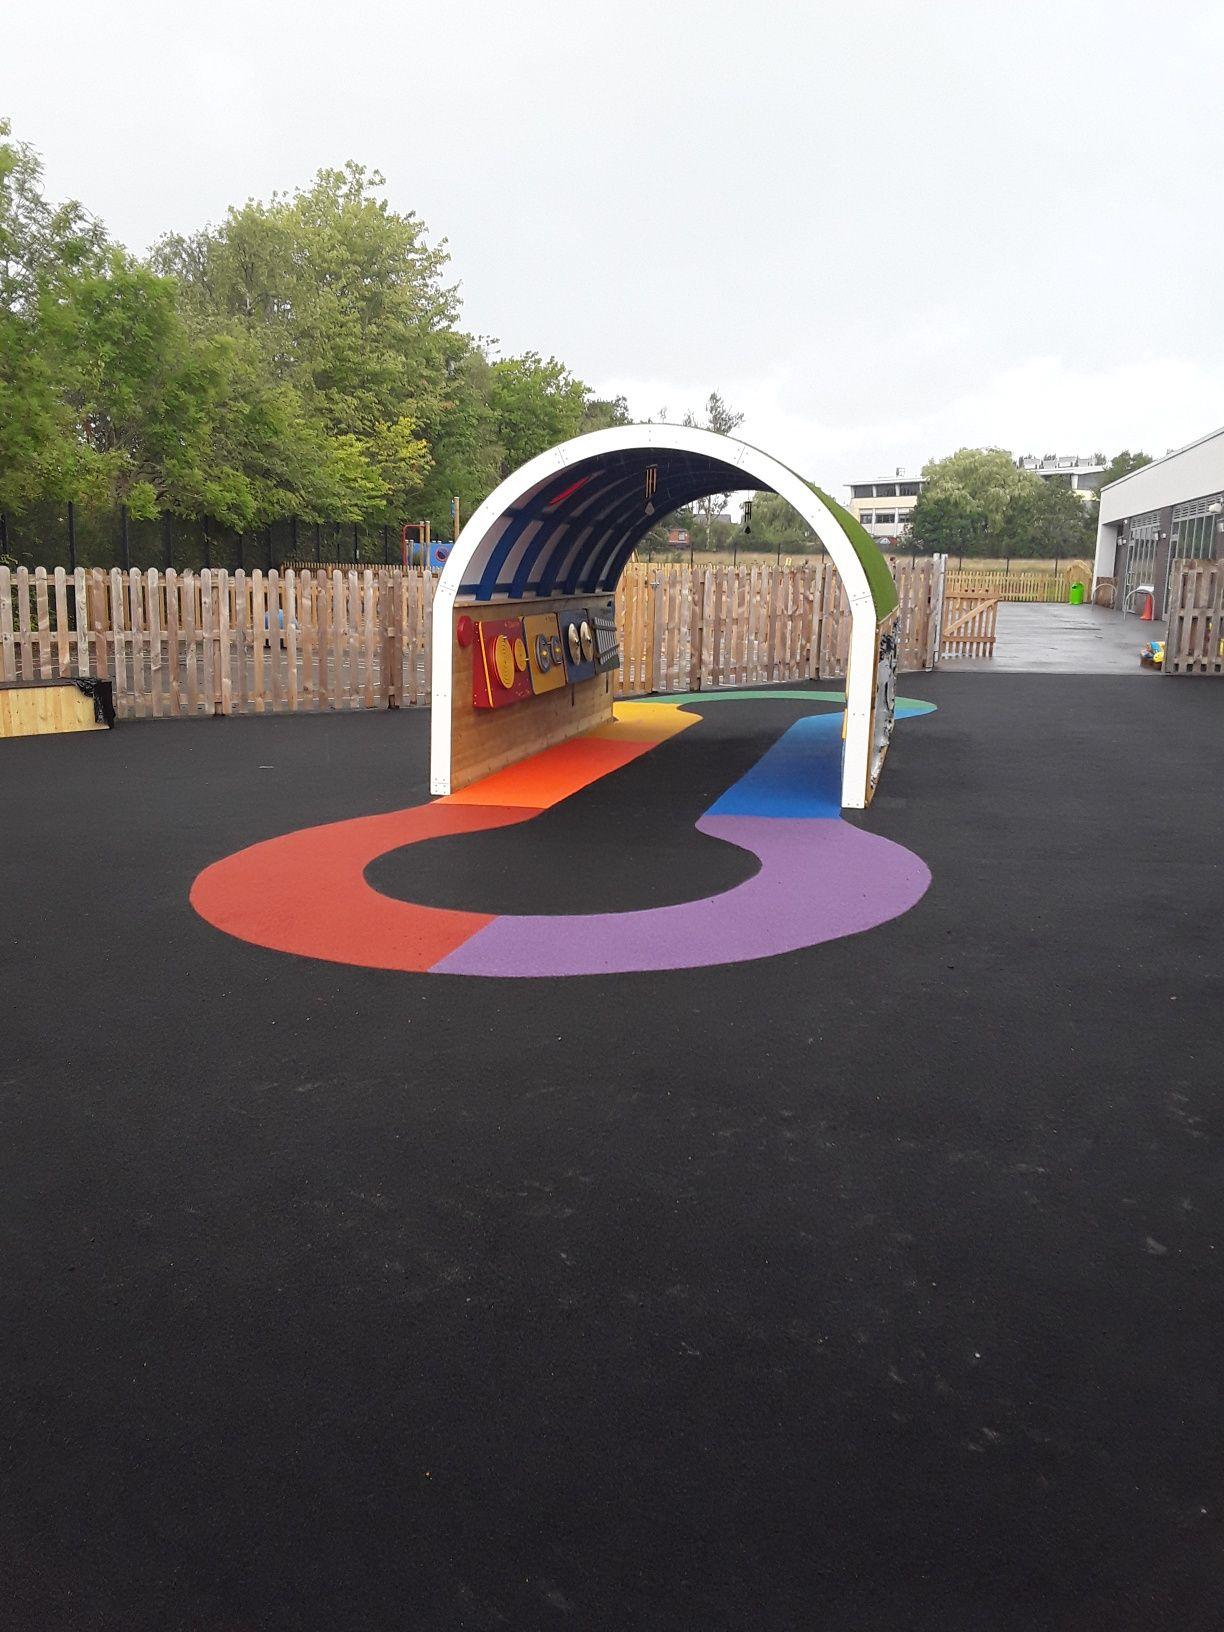 Playground Flooring Designs & Ideas Playground flooring